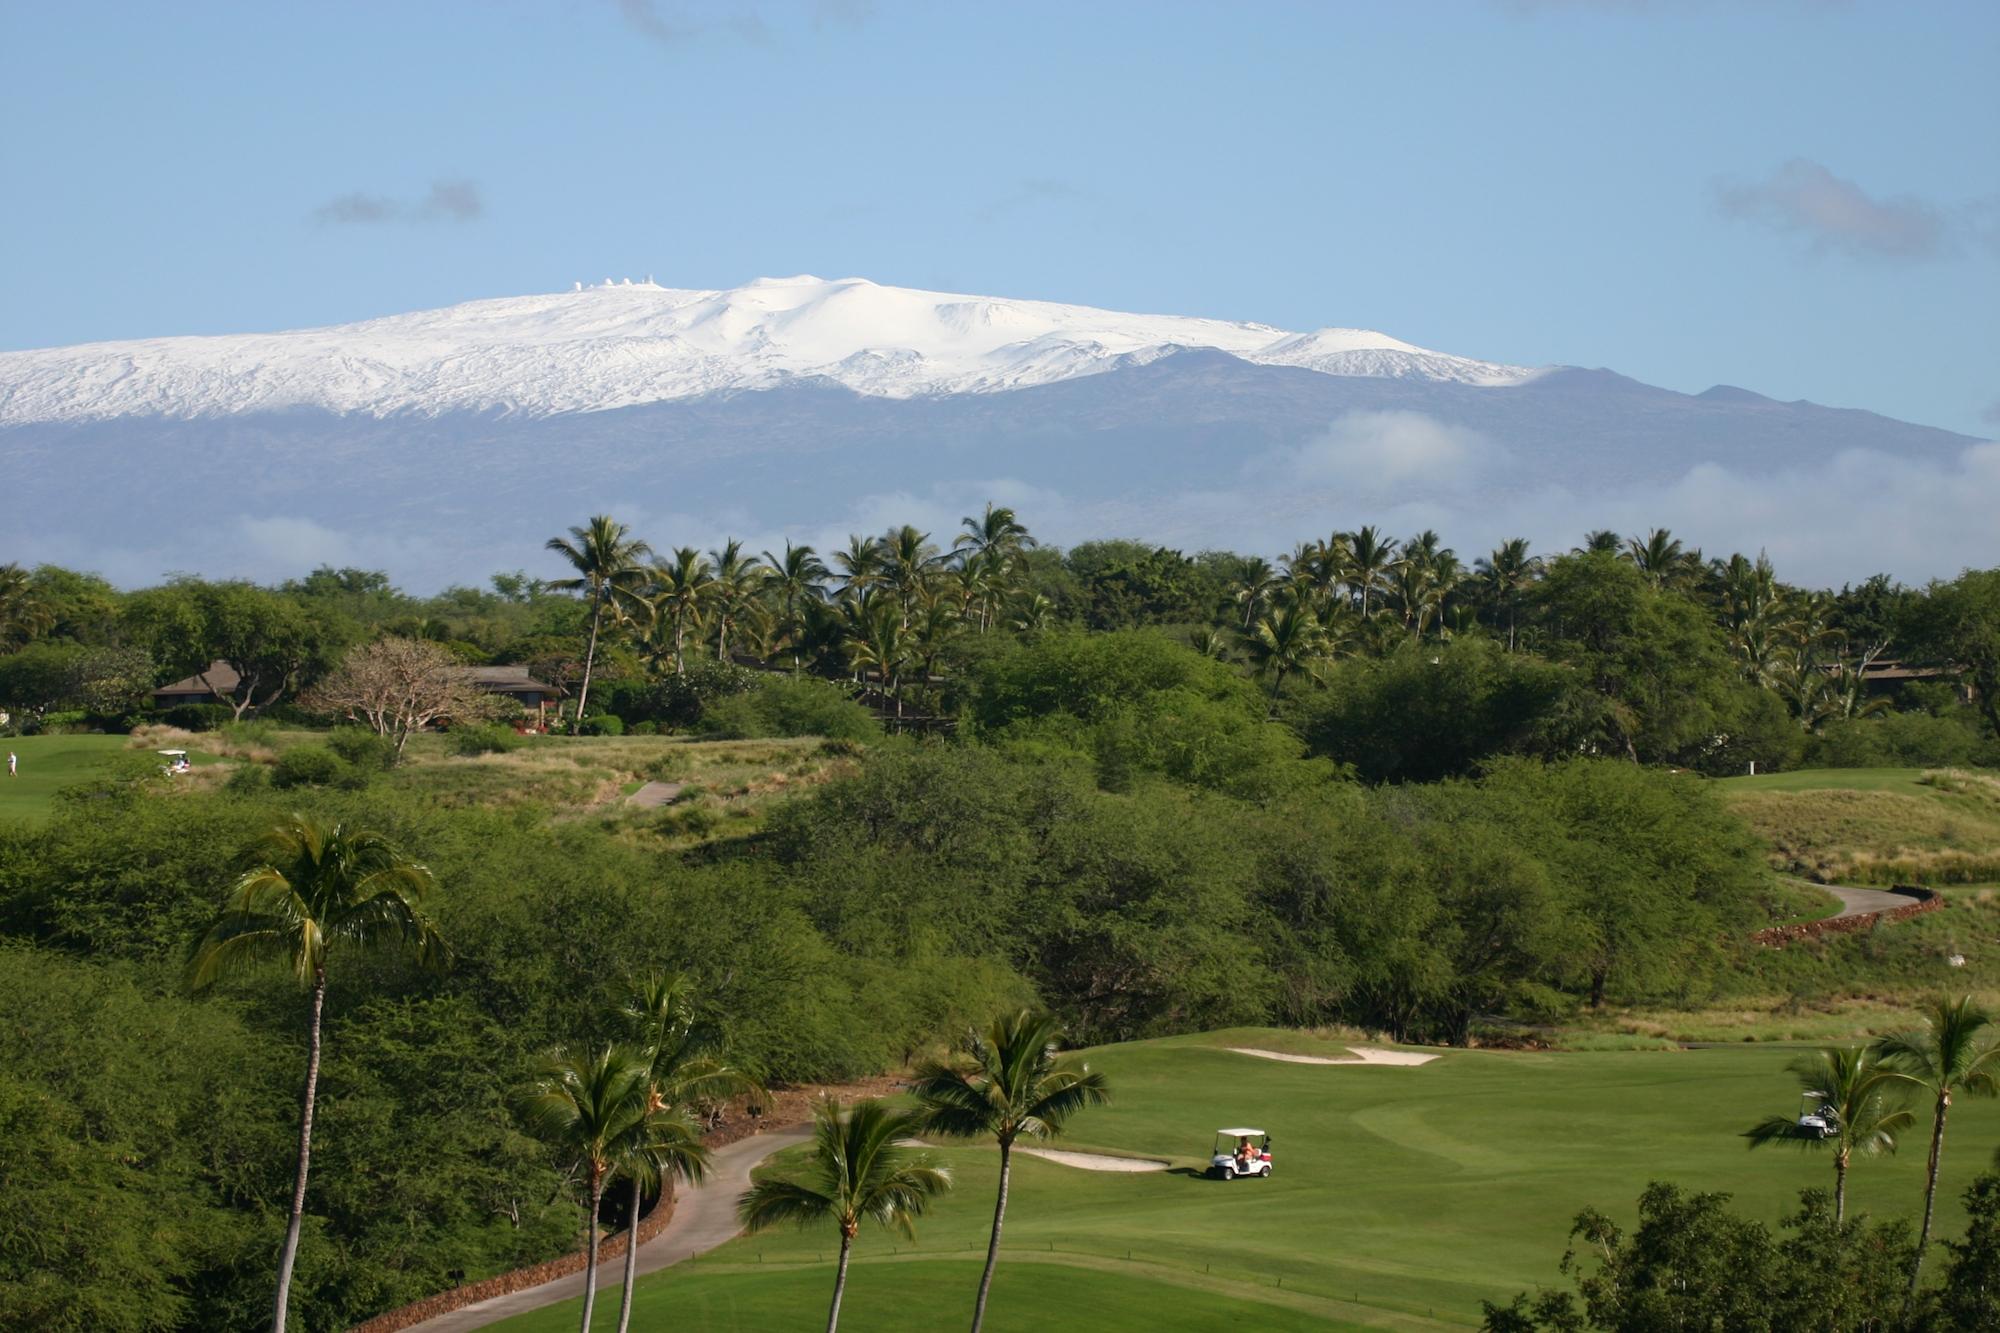 Big Island Visitors Bureau (BIVB) Kirk Lee Aeder